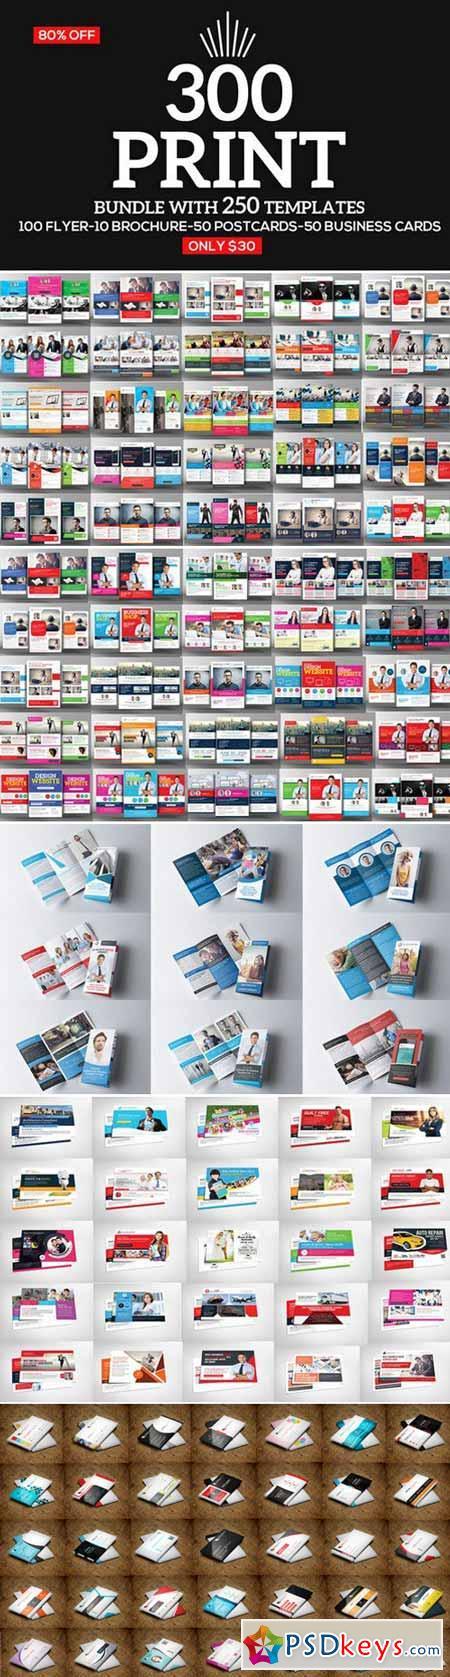 300 Print Templates Bundle 396011 Update!